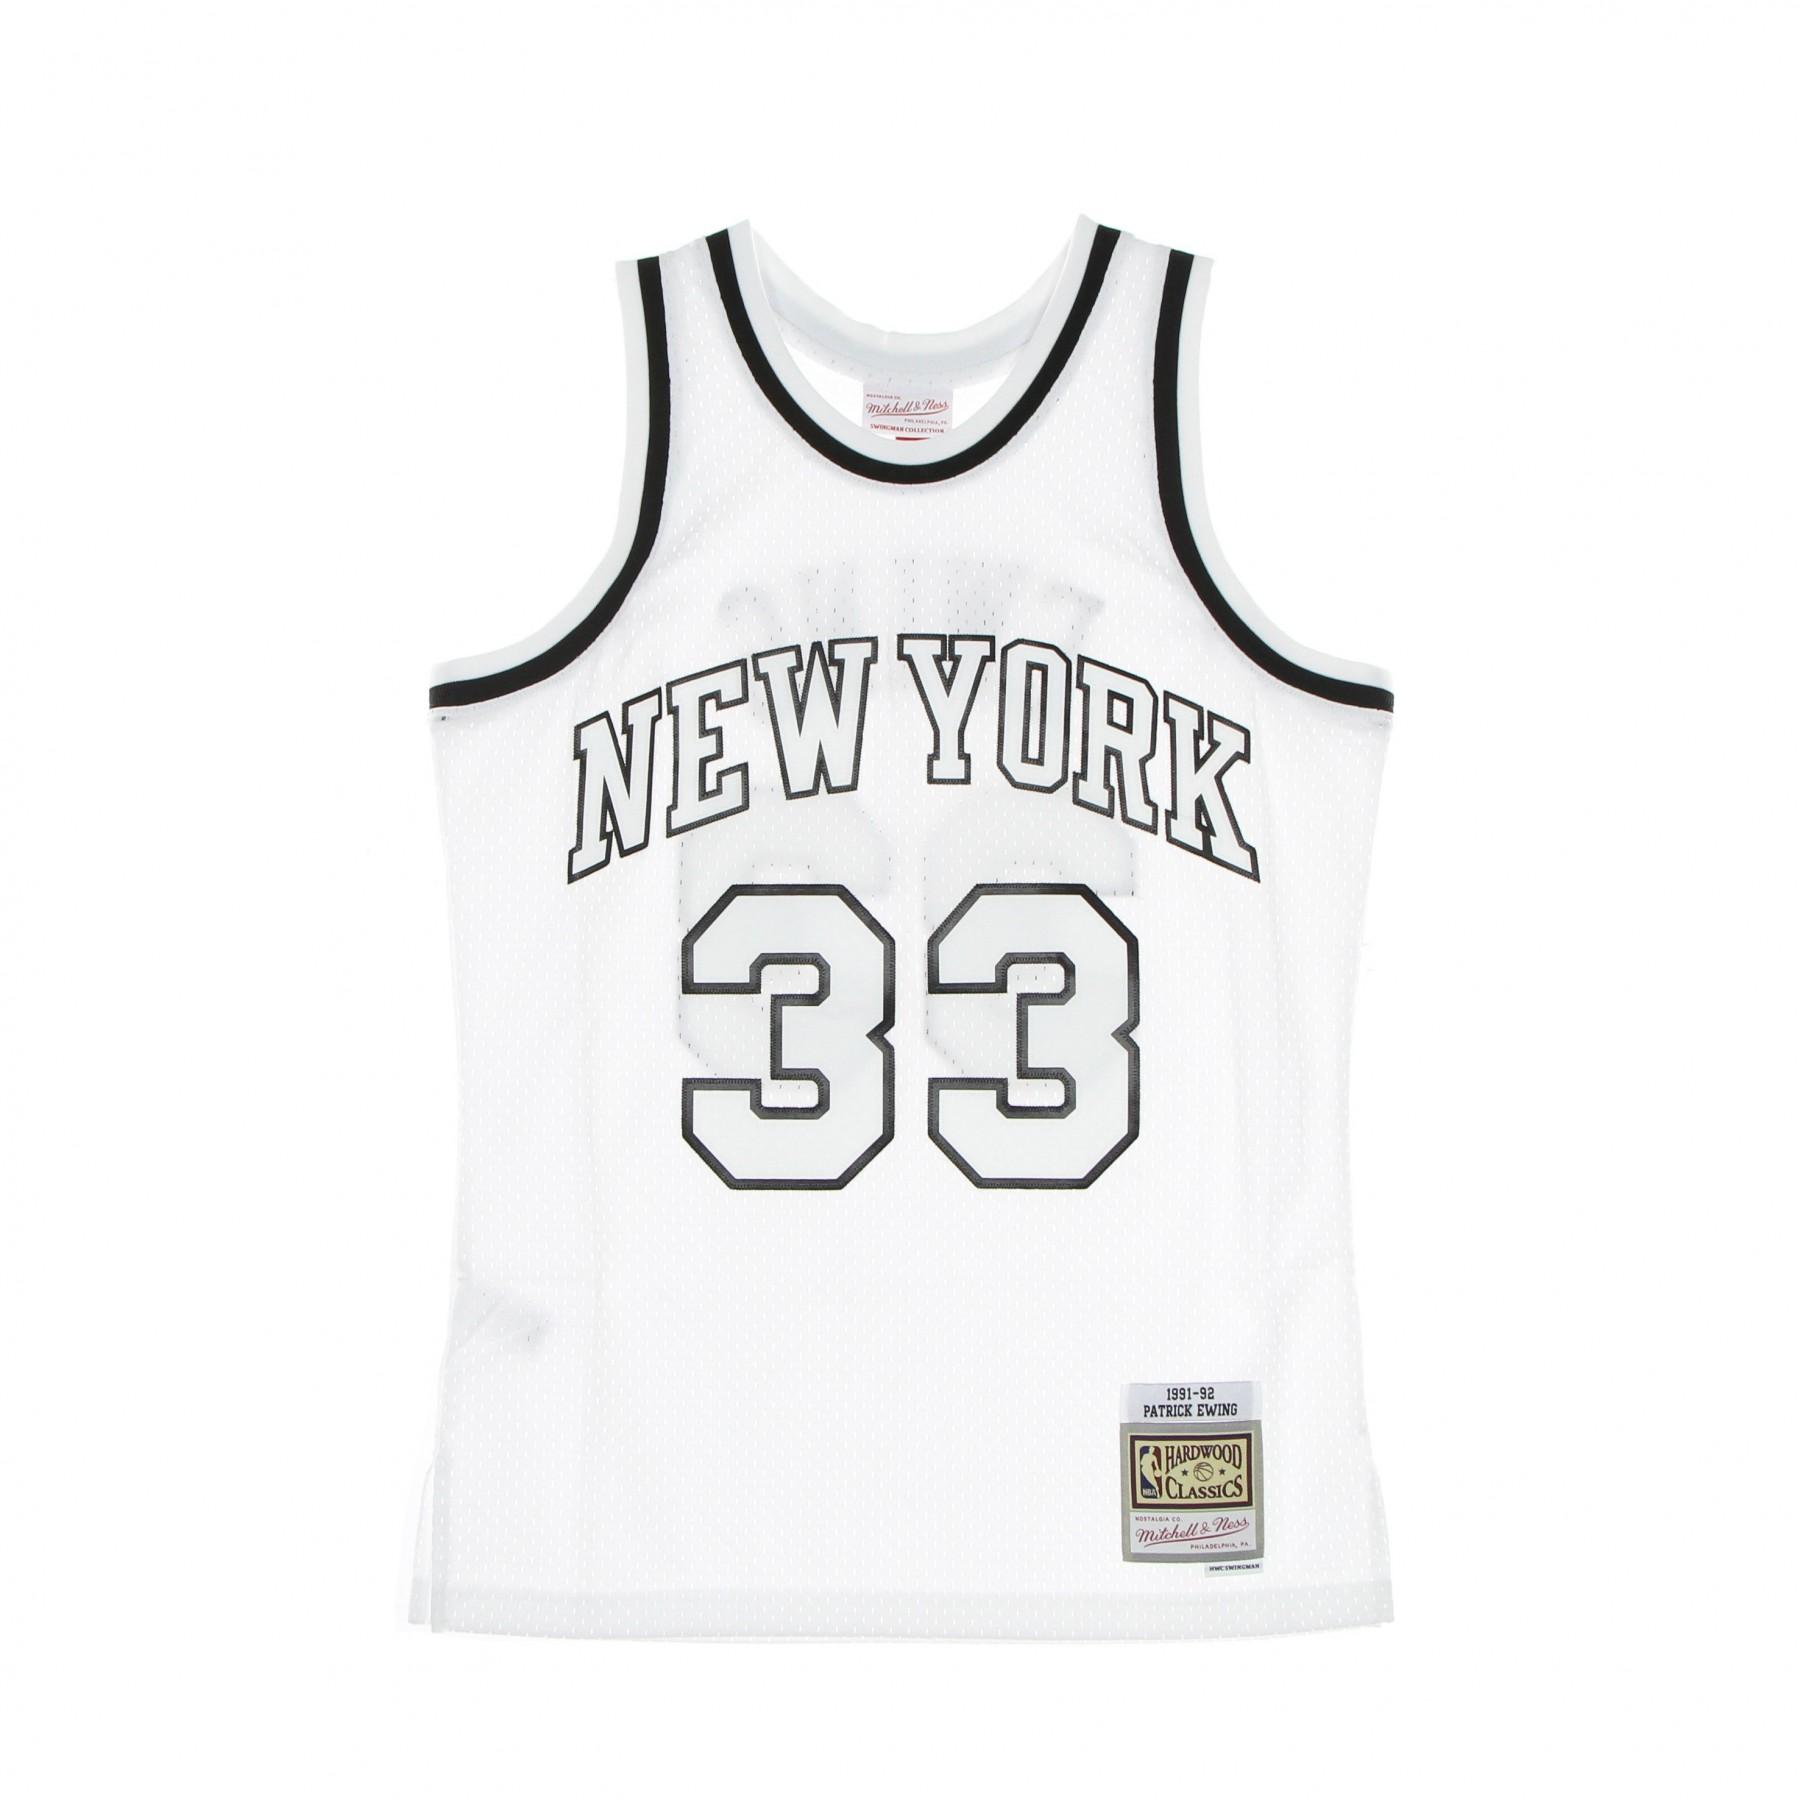 canotta basket uomo nba white black swingman jersey hardwood classics no 33 patrick ewing 1991-92 neykni XL